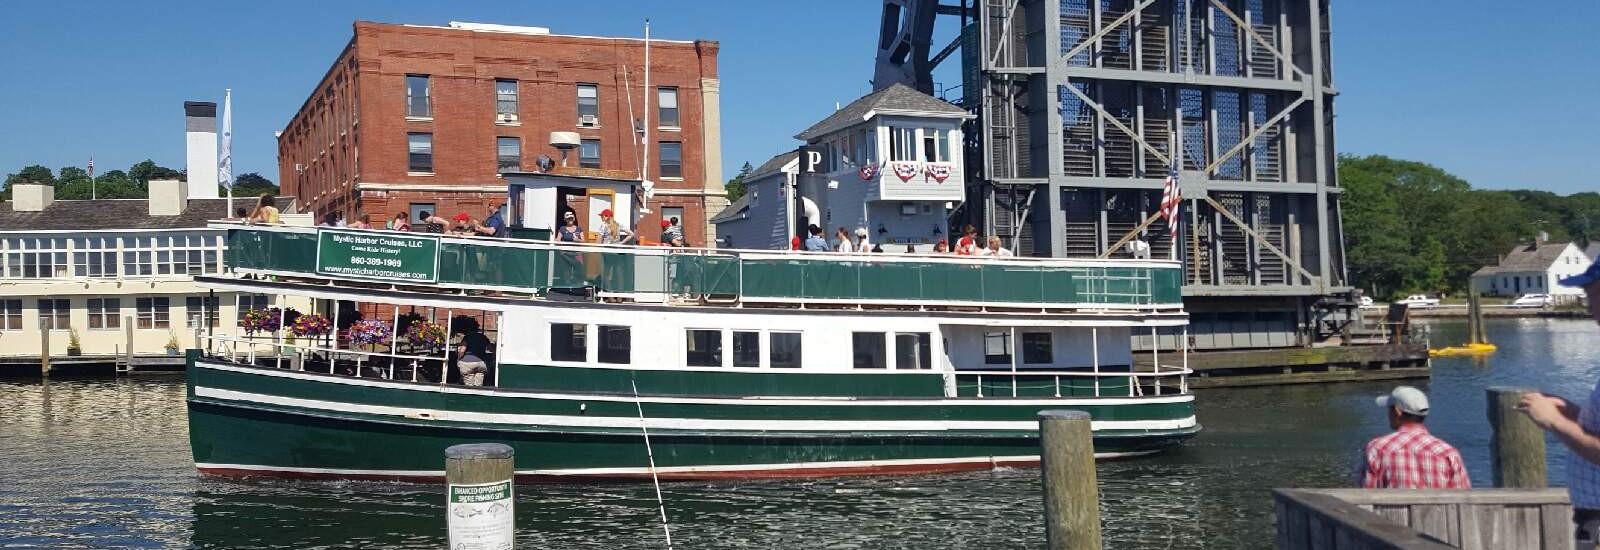 Mystic Harbor Cruises - Prudence